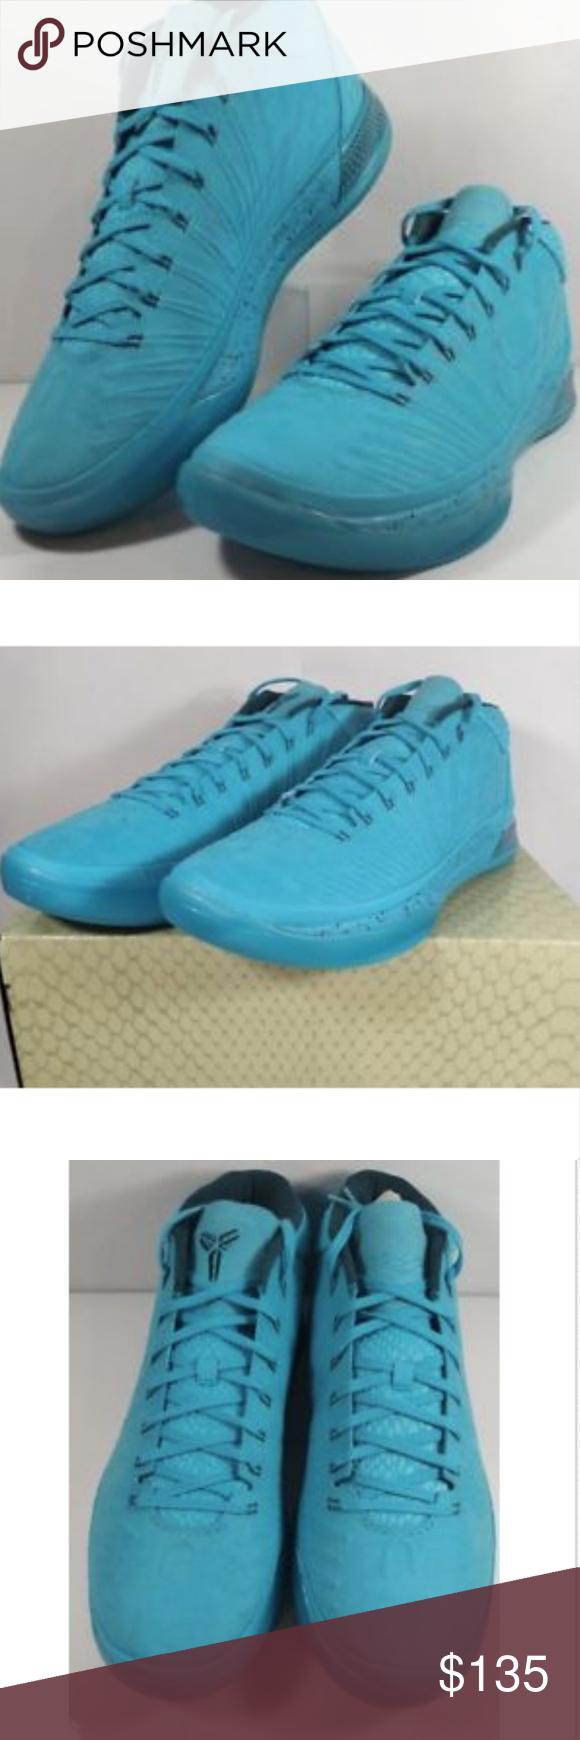 d2881a9fdad Nike Kobe AD Blue Fury Size 11 Nike Kobe AD A.D. Mid Honesty Mamba  Mentality Blue Fury Size 11 922482 400 Nike Shoes Athletic Shoes